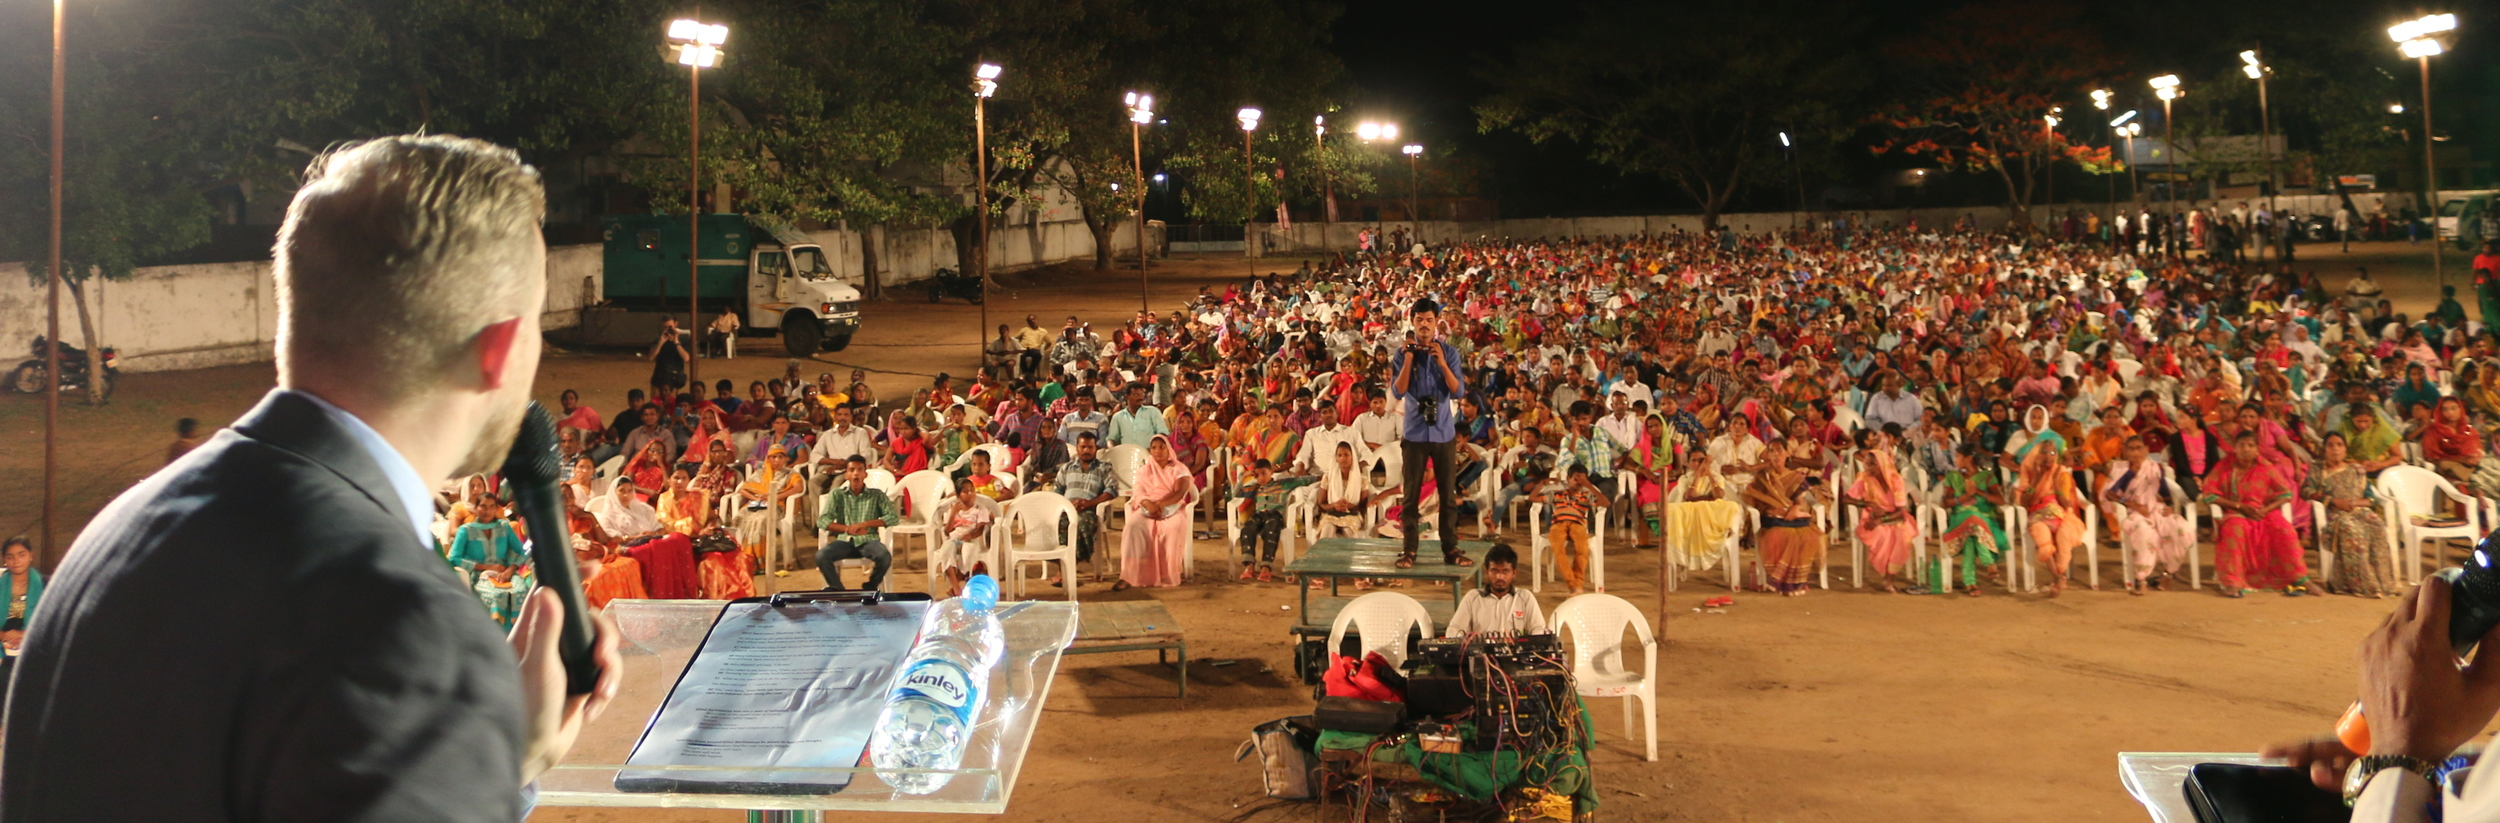 The 3rd night of my Gospel Crusade in India